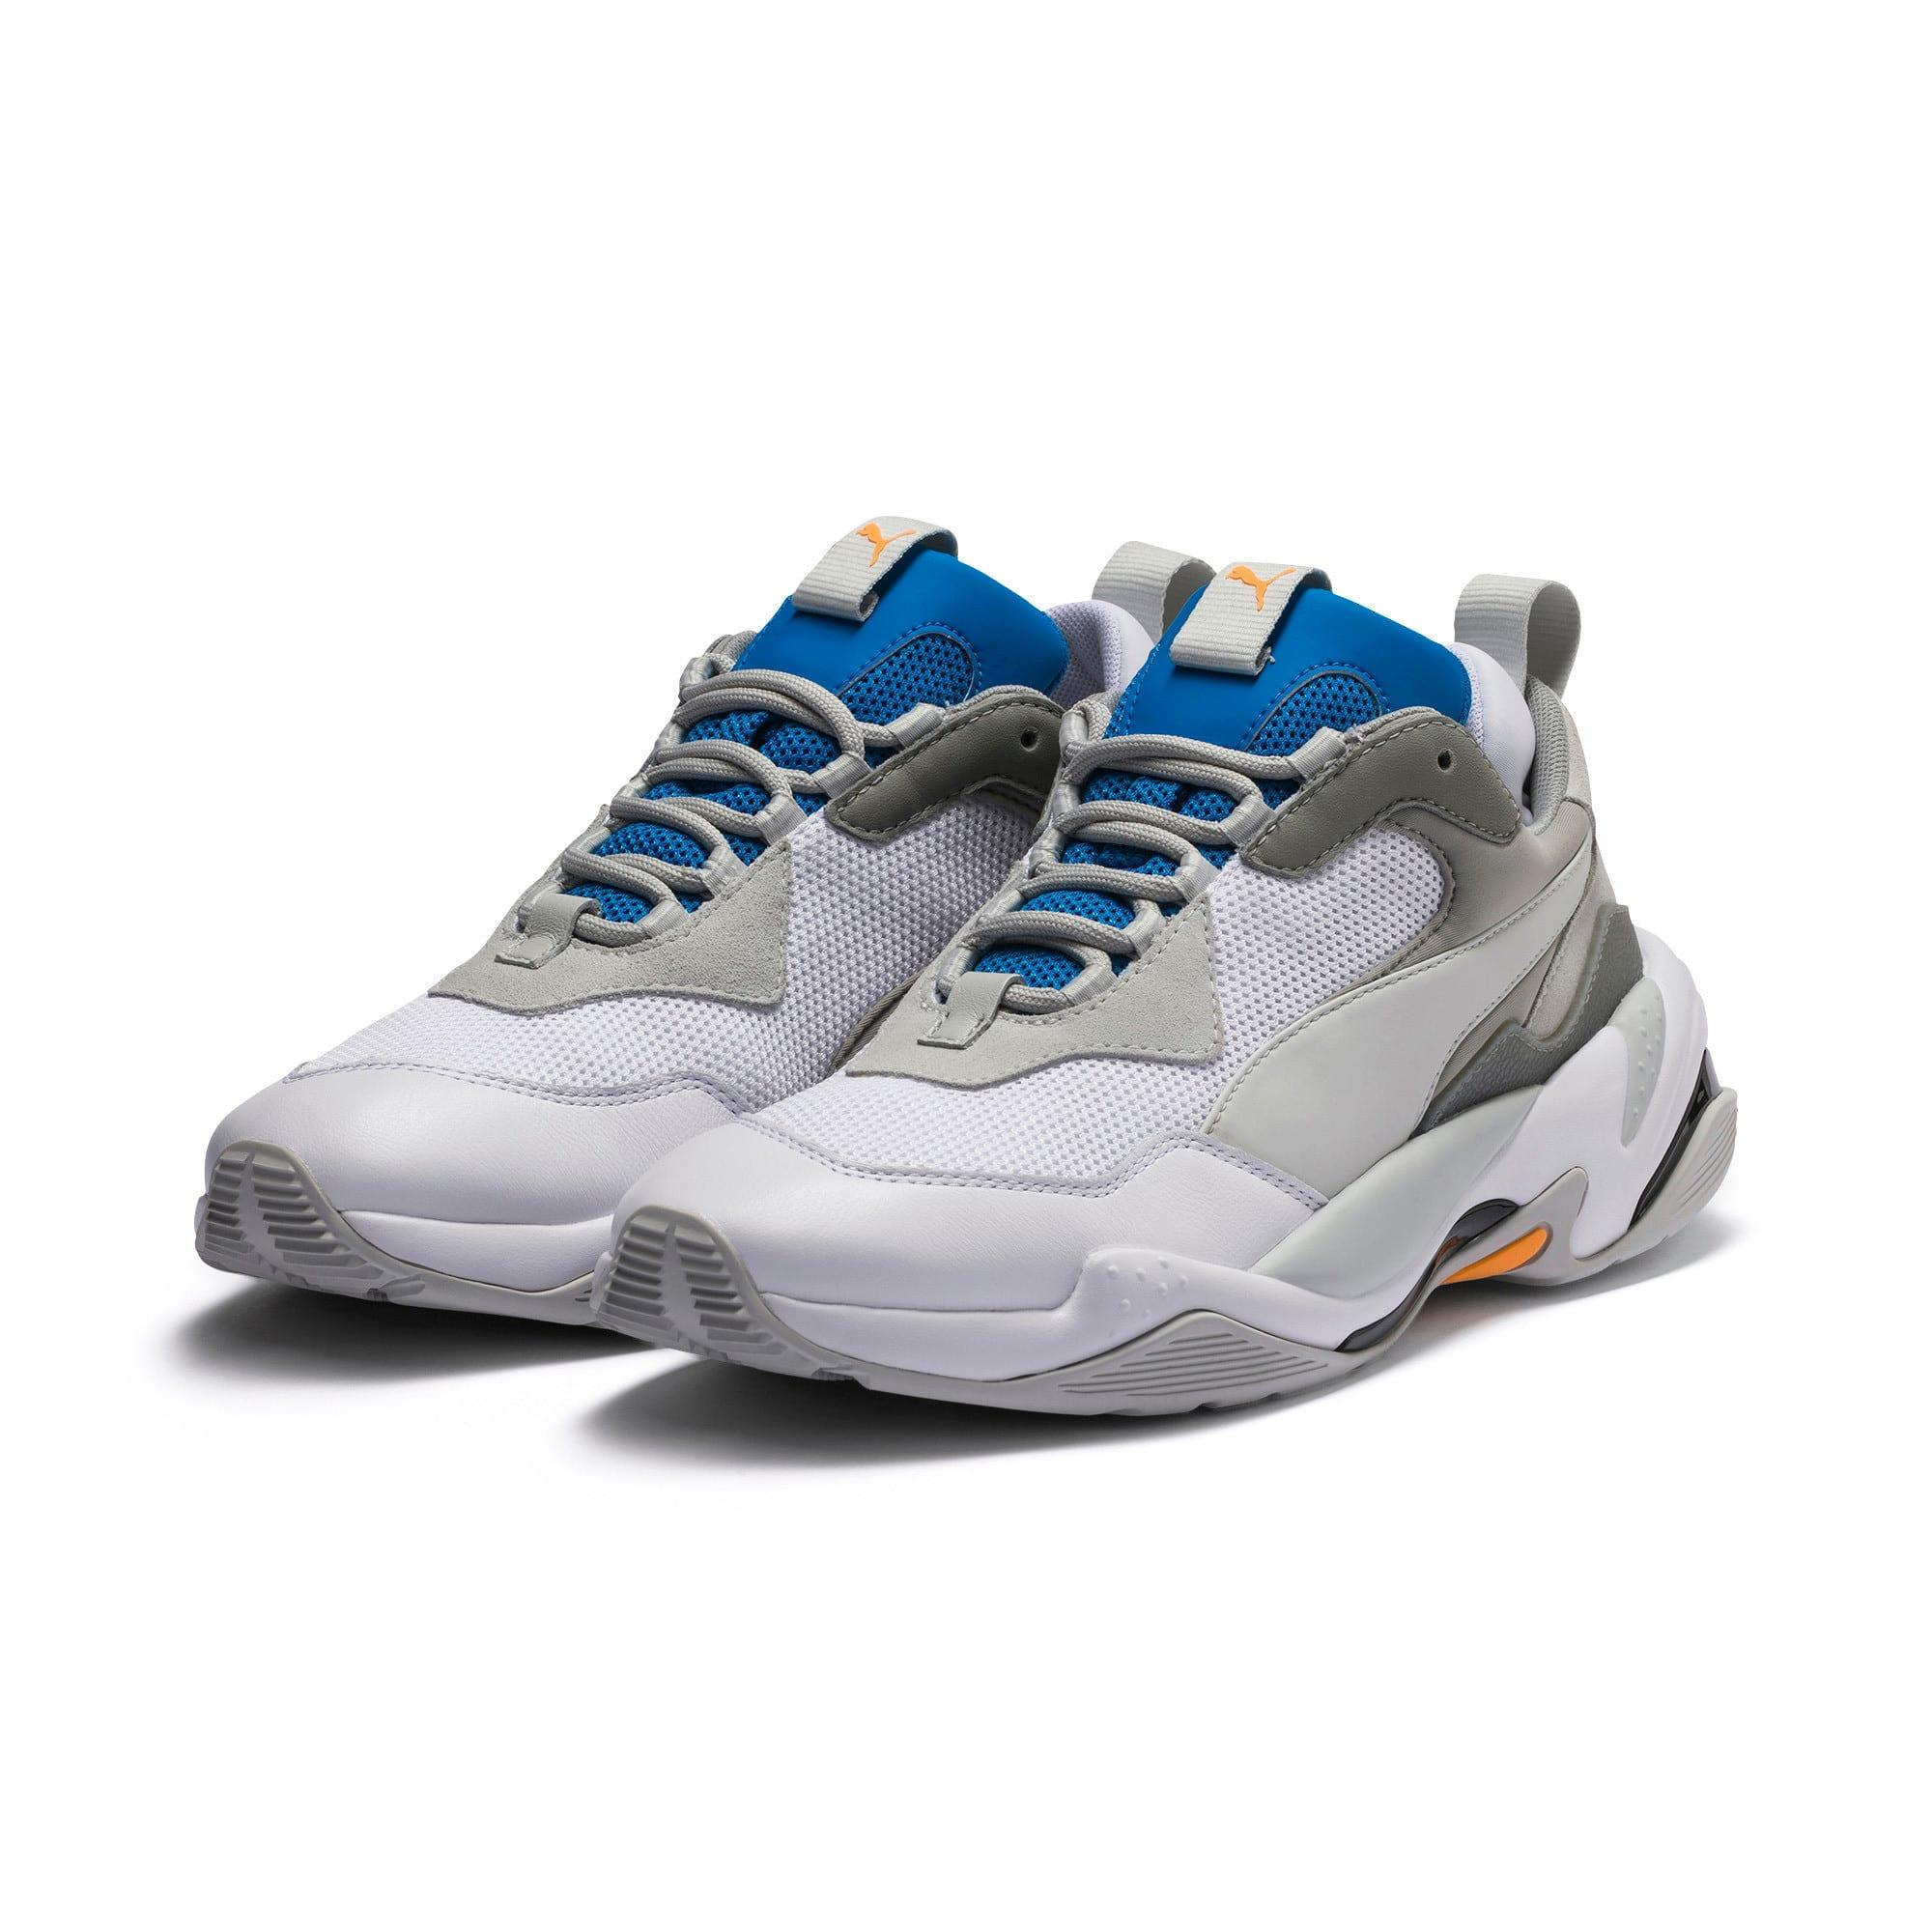 Thumbnail 2 of Sneakers Thunder Spectra, Glacier Gray-Indigo Bunting, medium